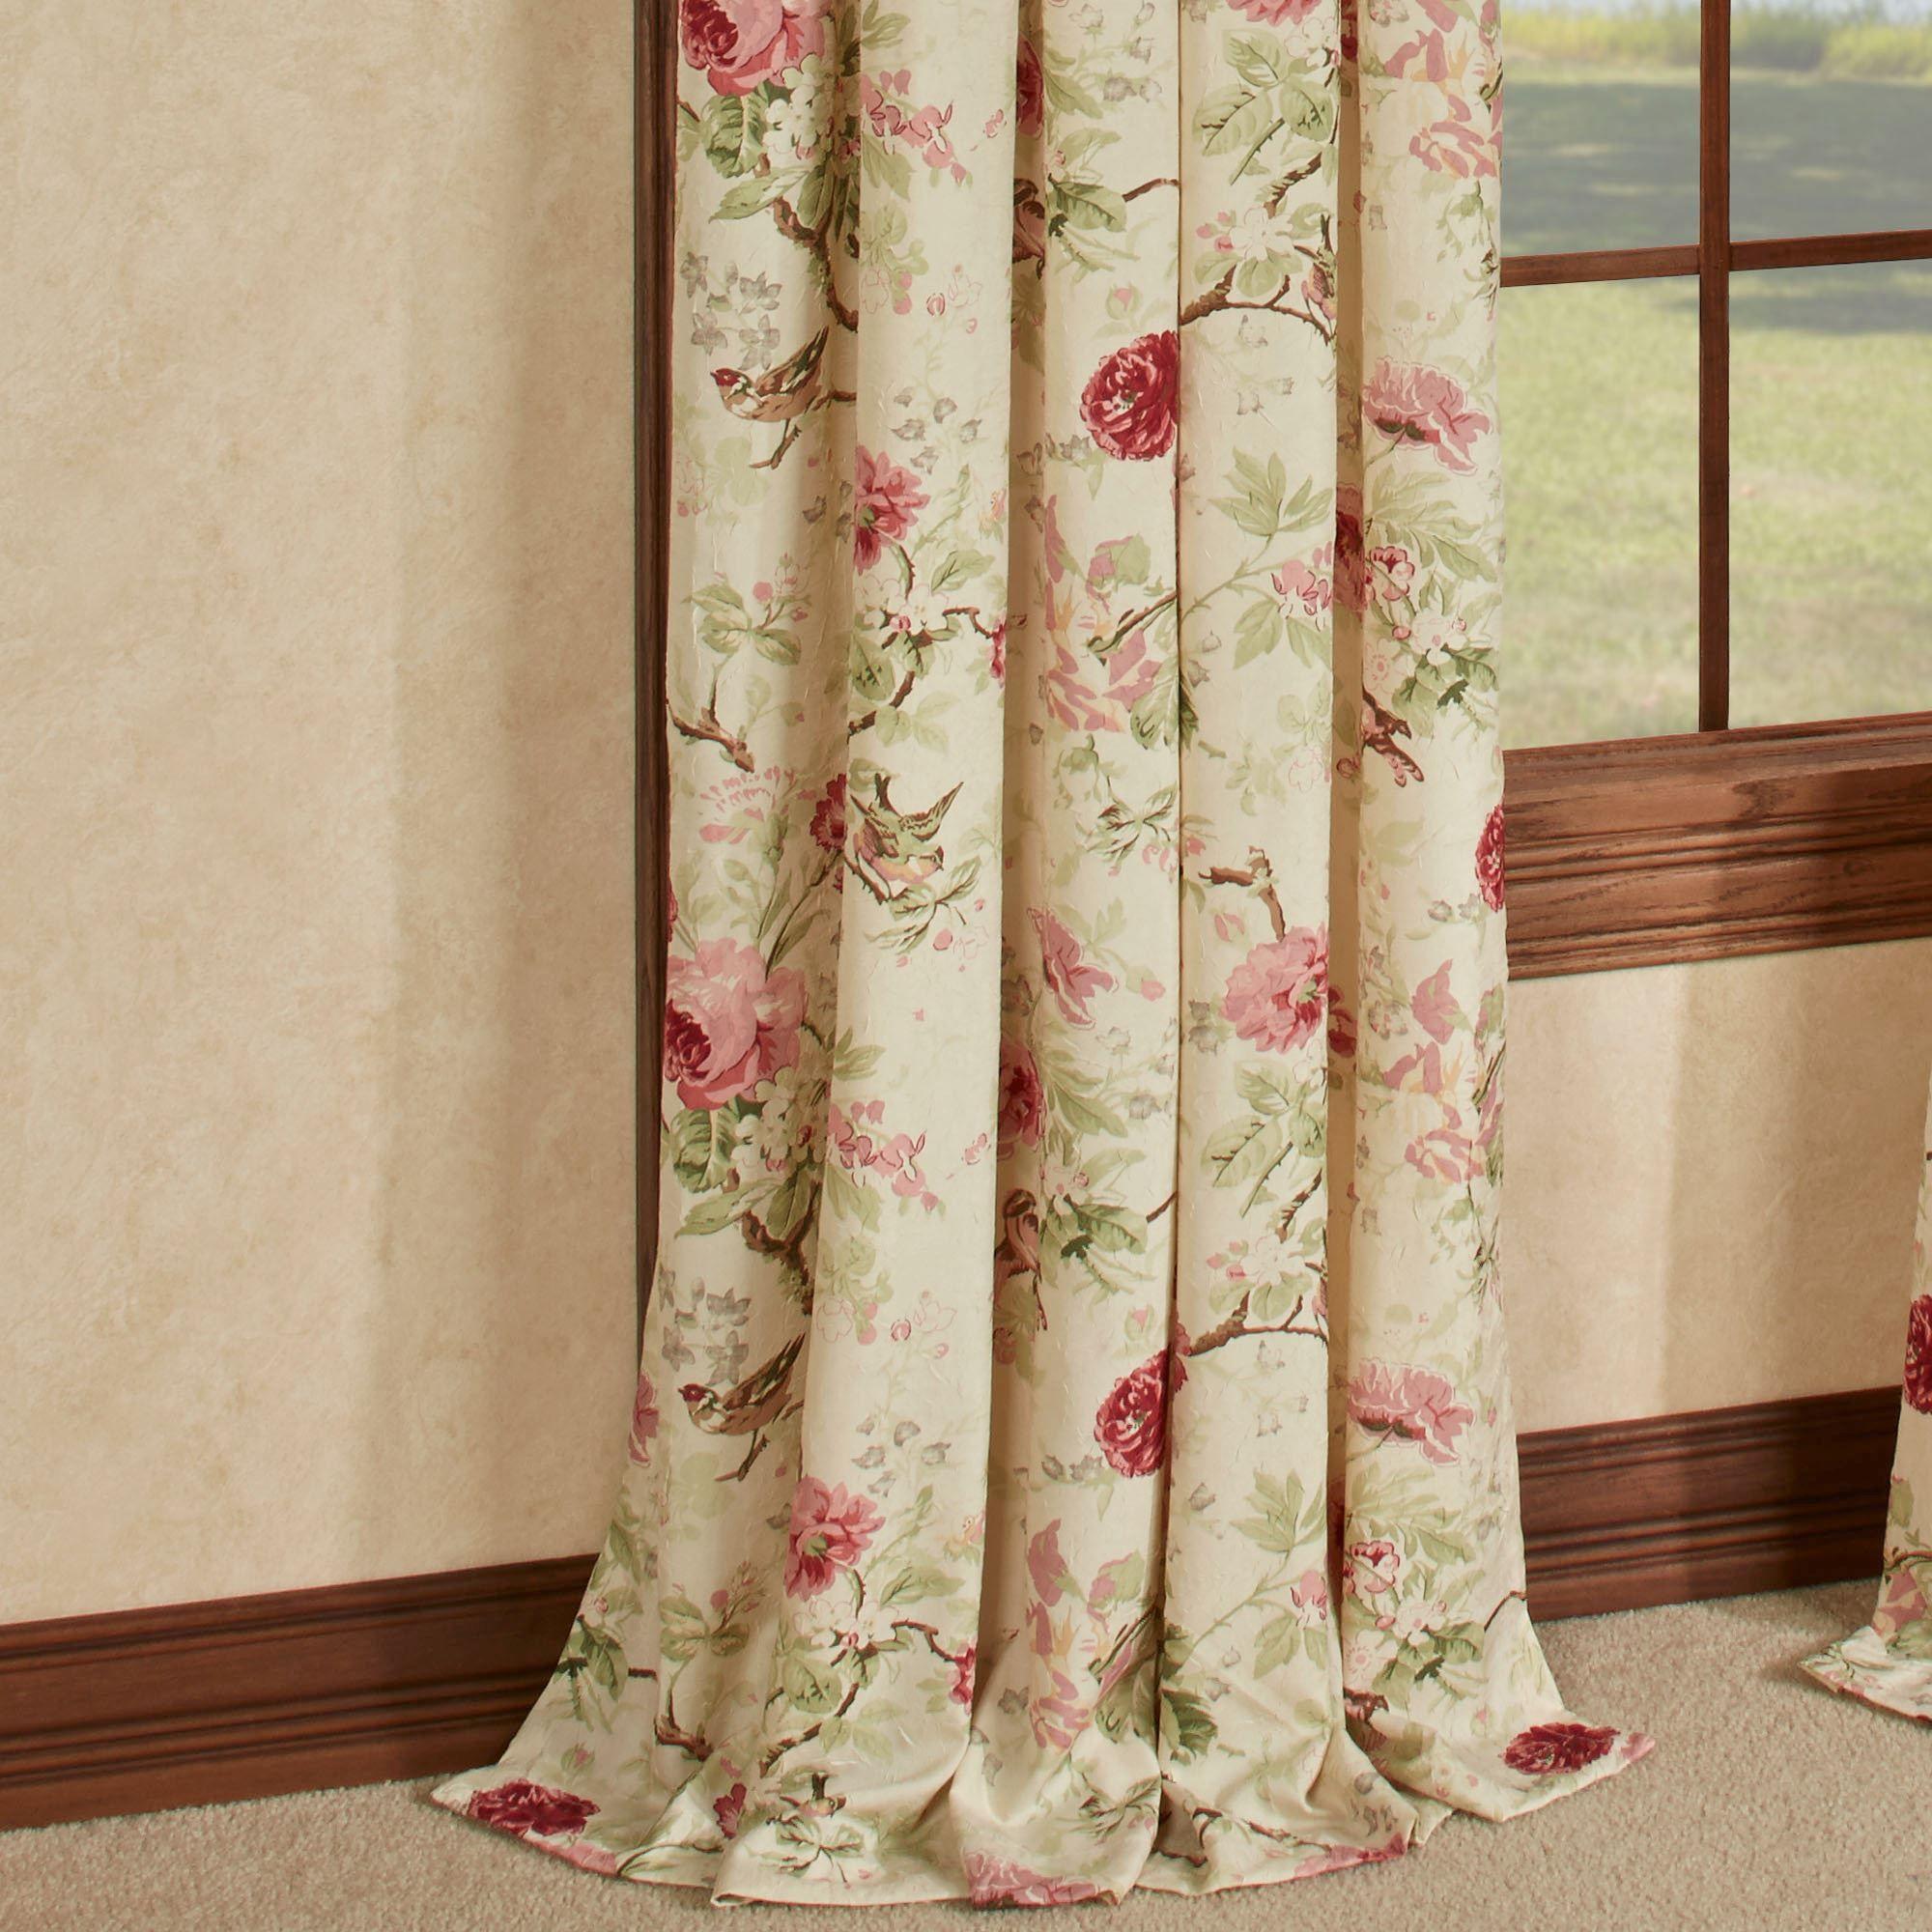 x p tab panel celine panels curtains curtain back jacobean treatment floral window